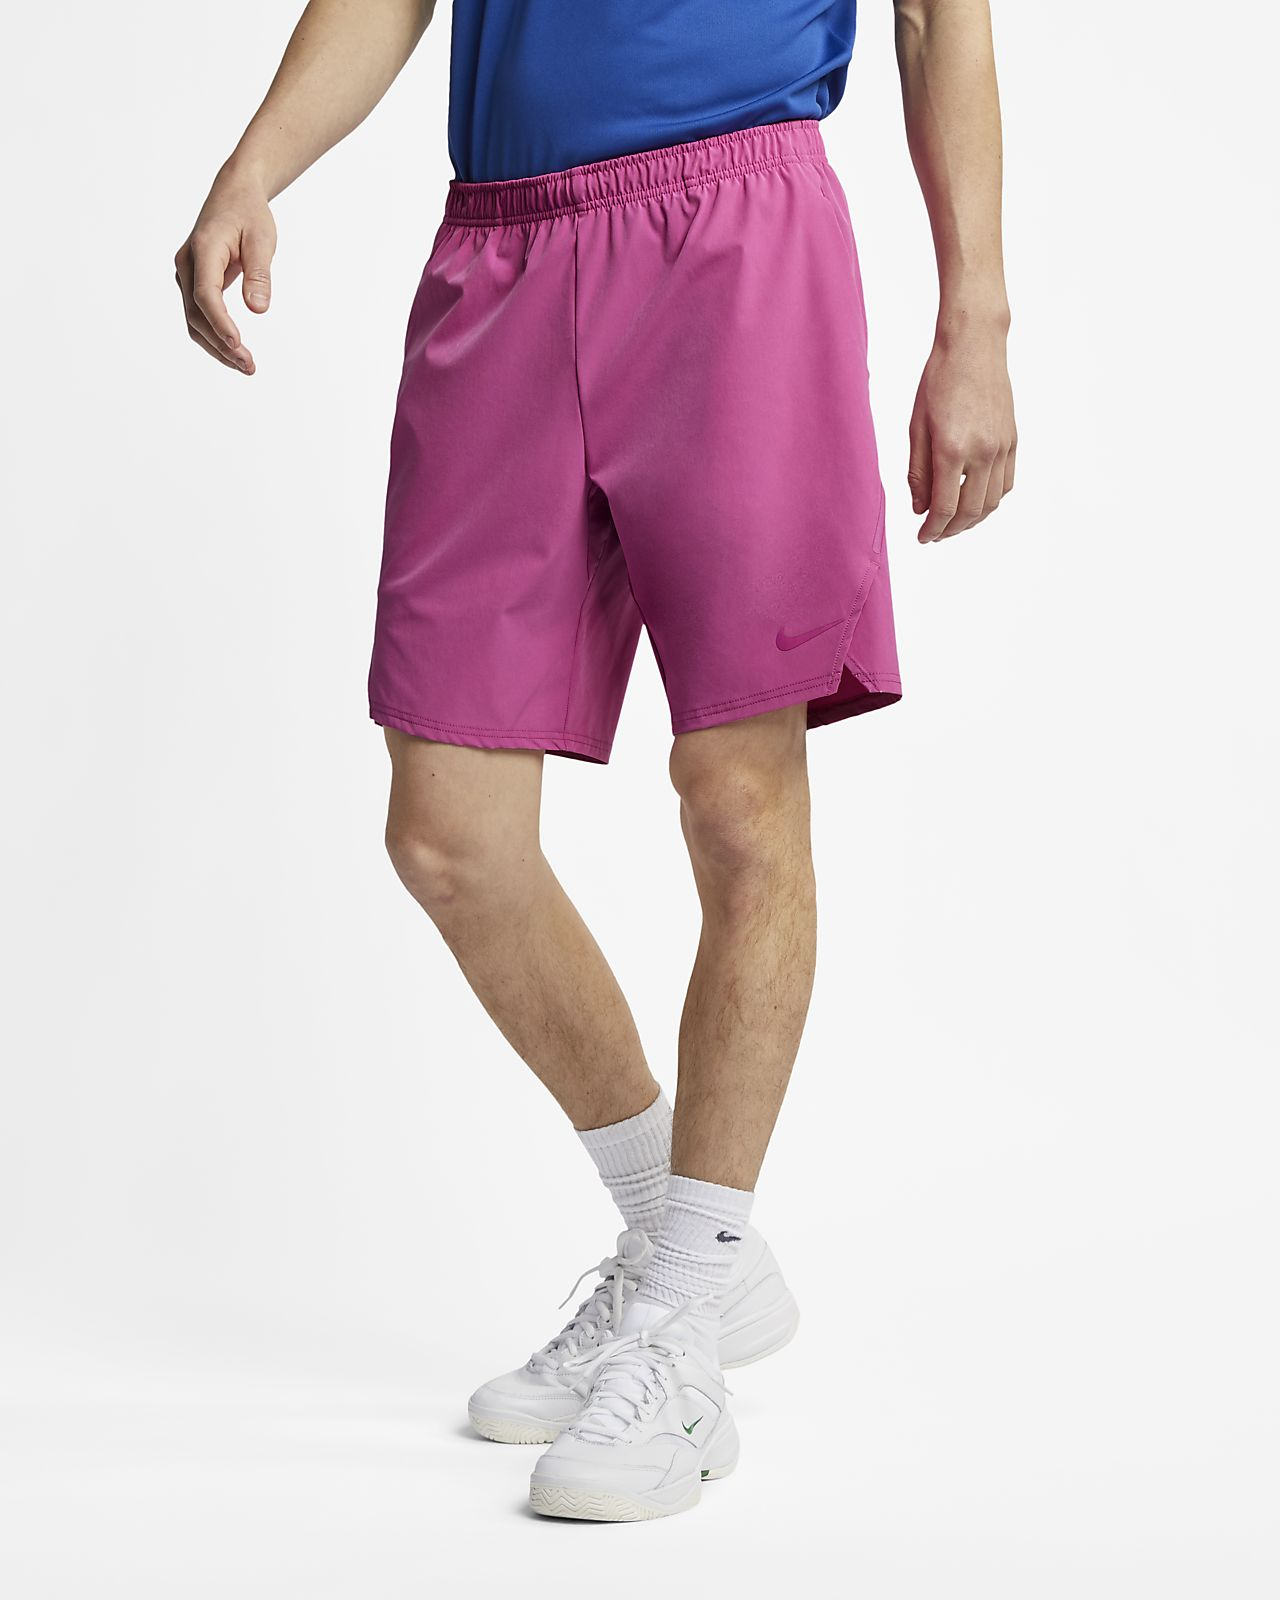 43fe689f8e44c NikeCourt Flex Ace Men's Tennis Shorts. Nike.com GB